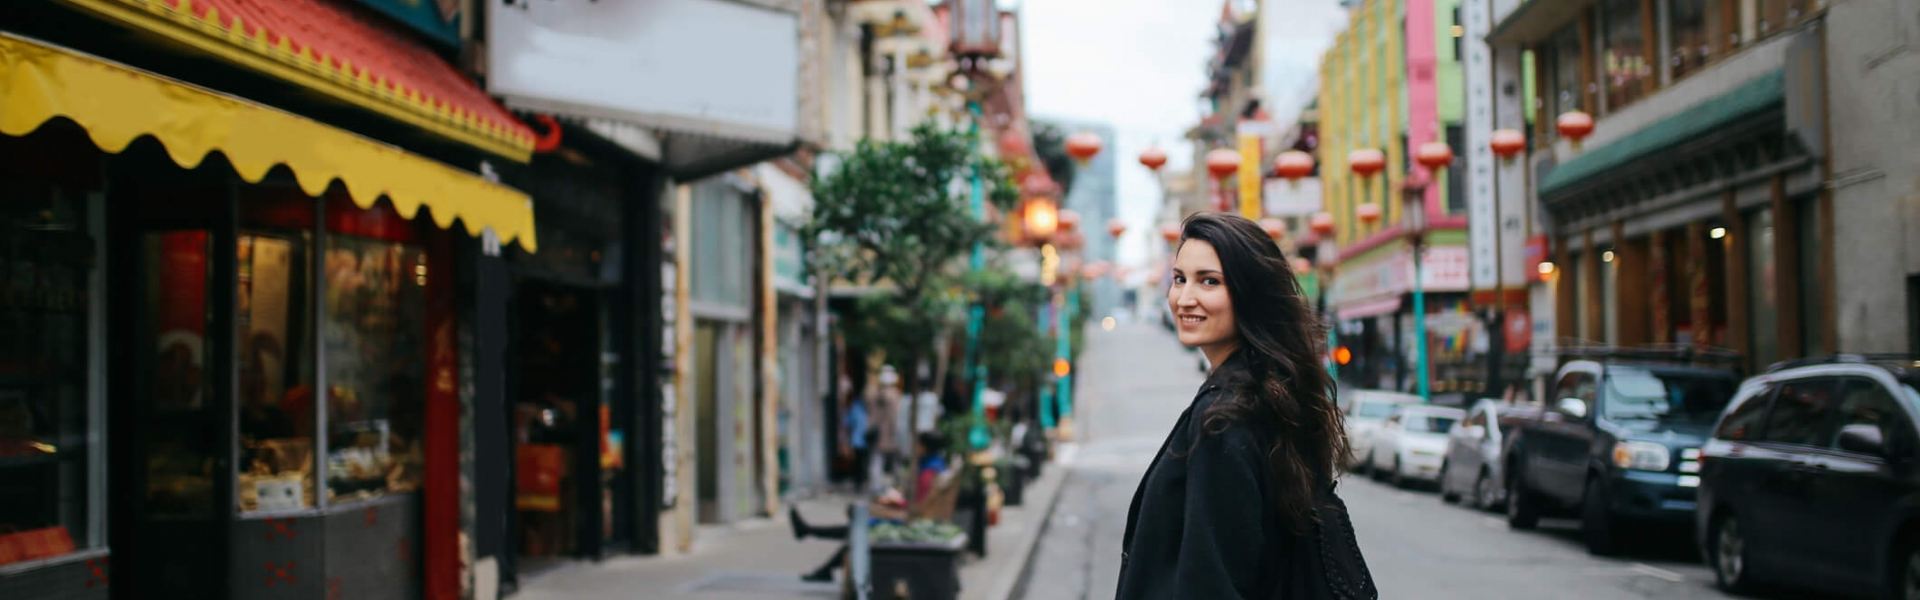 woman walking around chinatown in san francisco